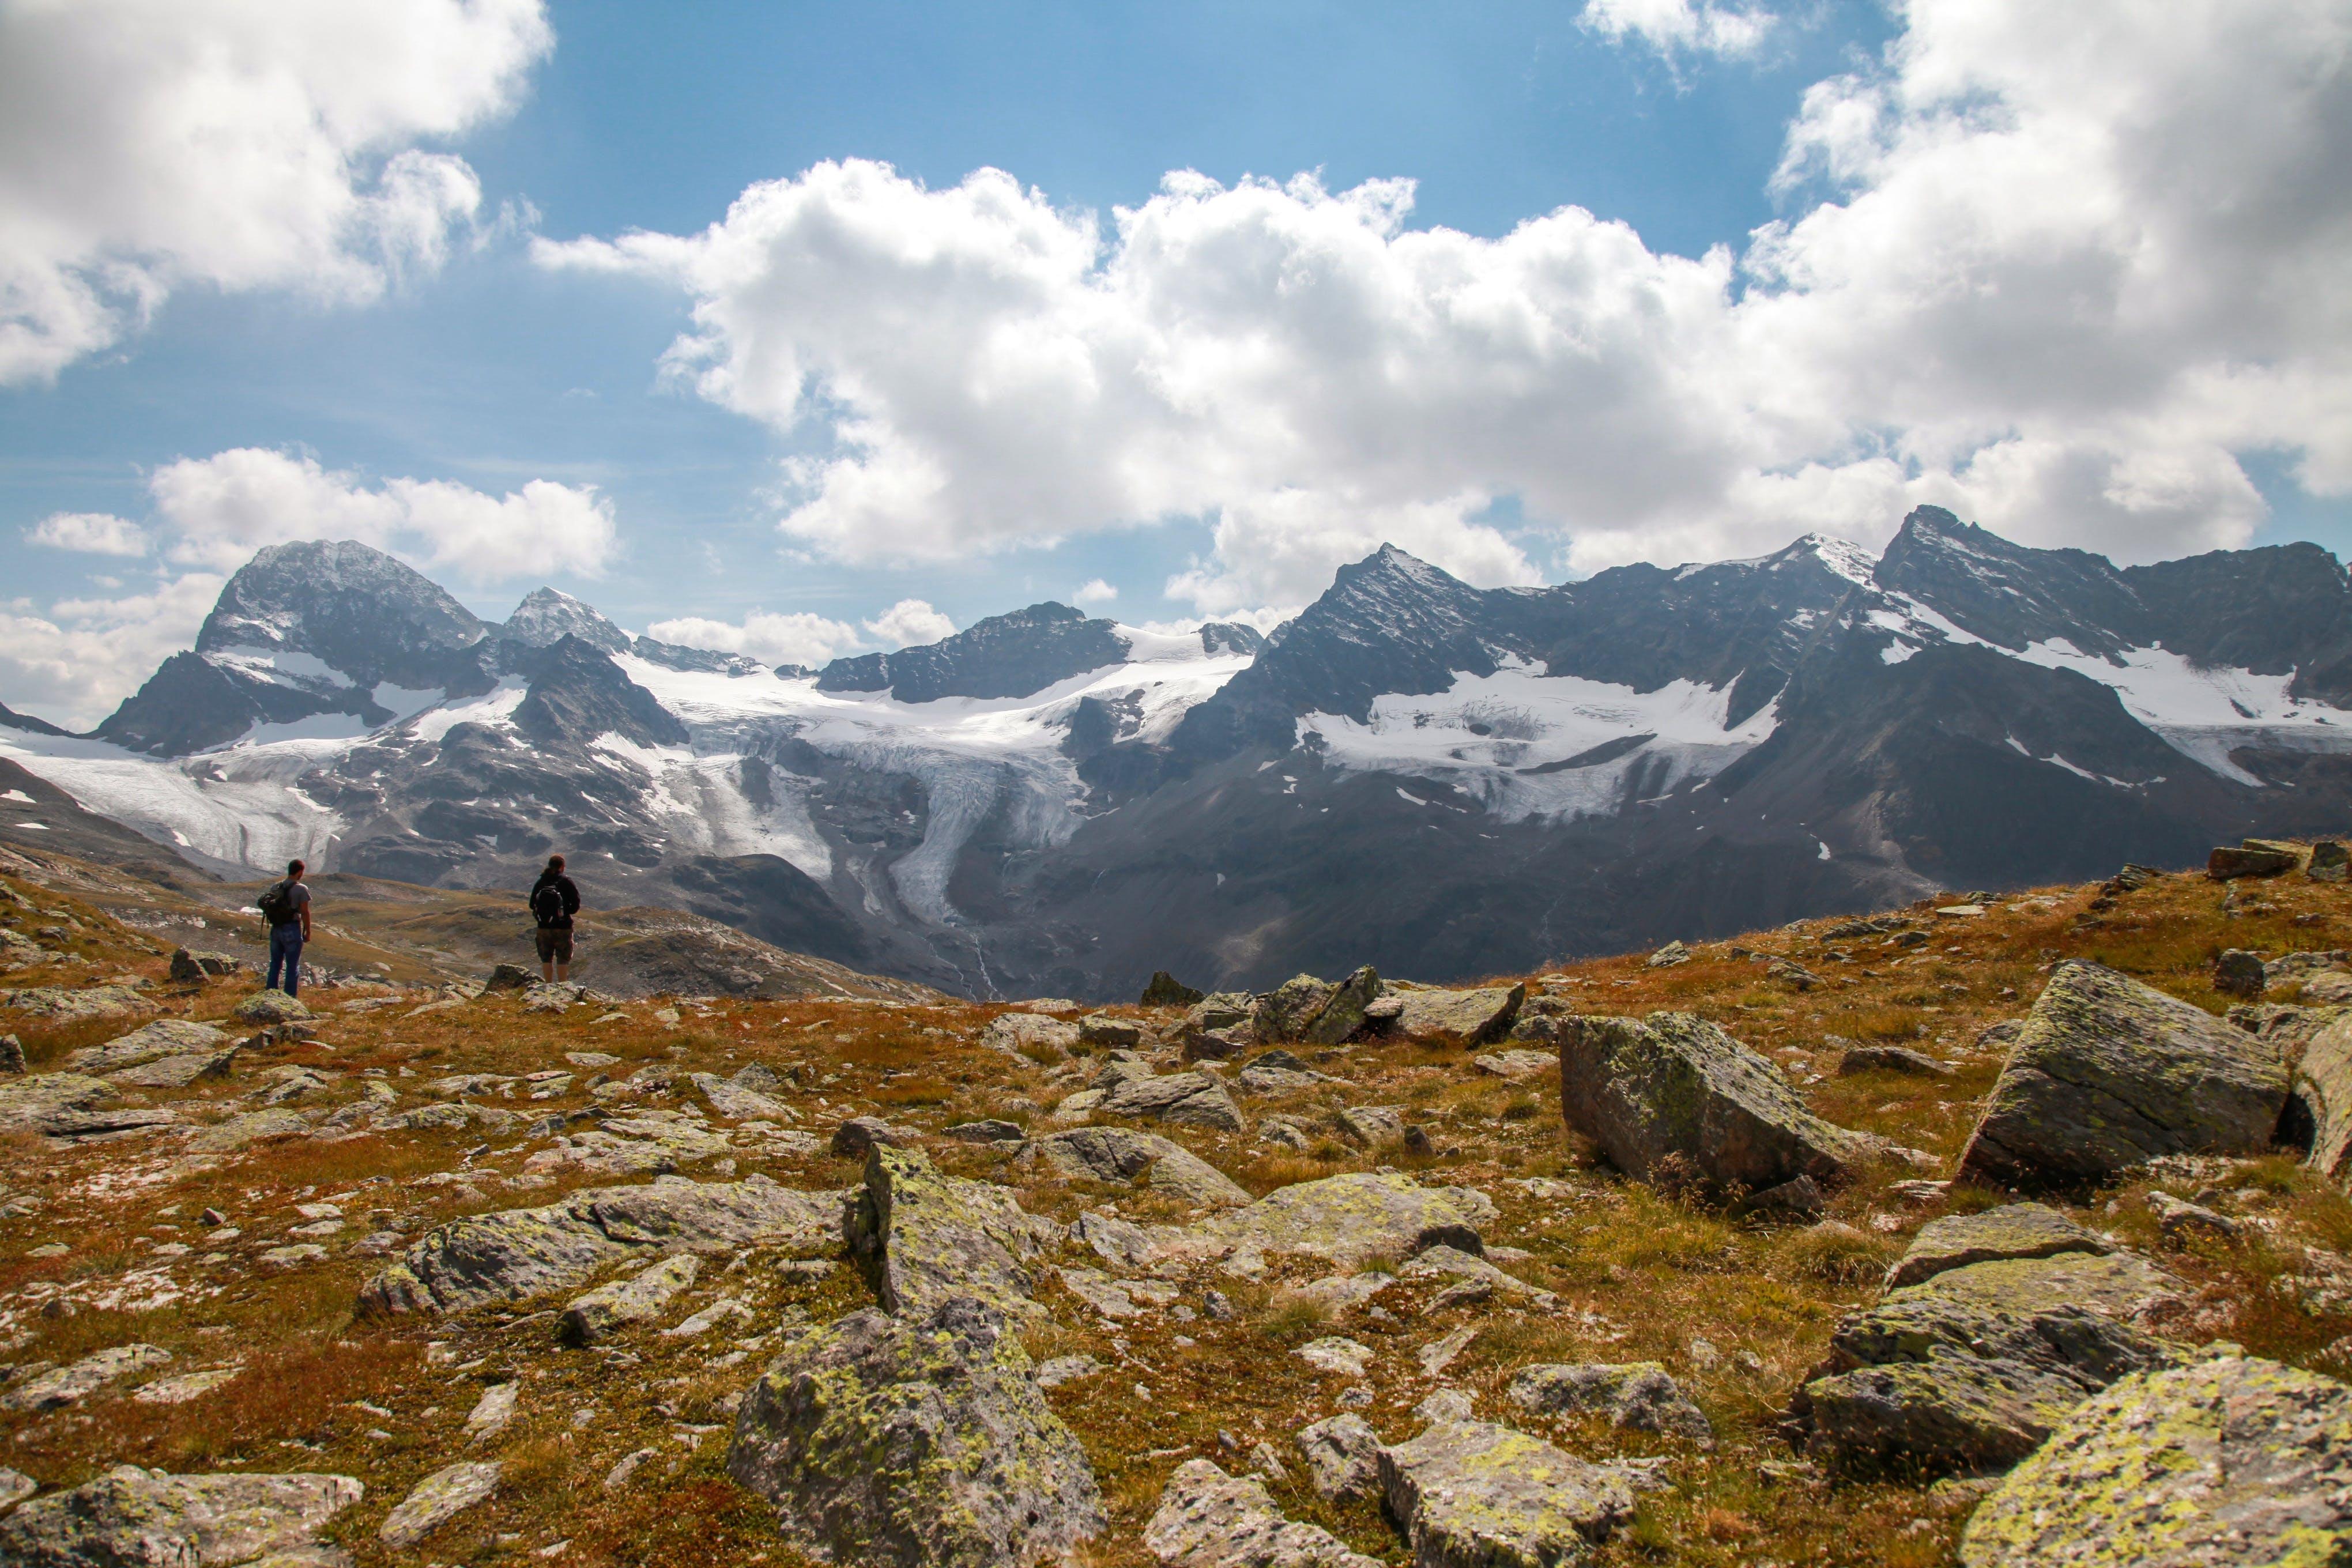 adventure, clouds, landscape